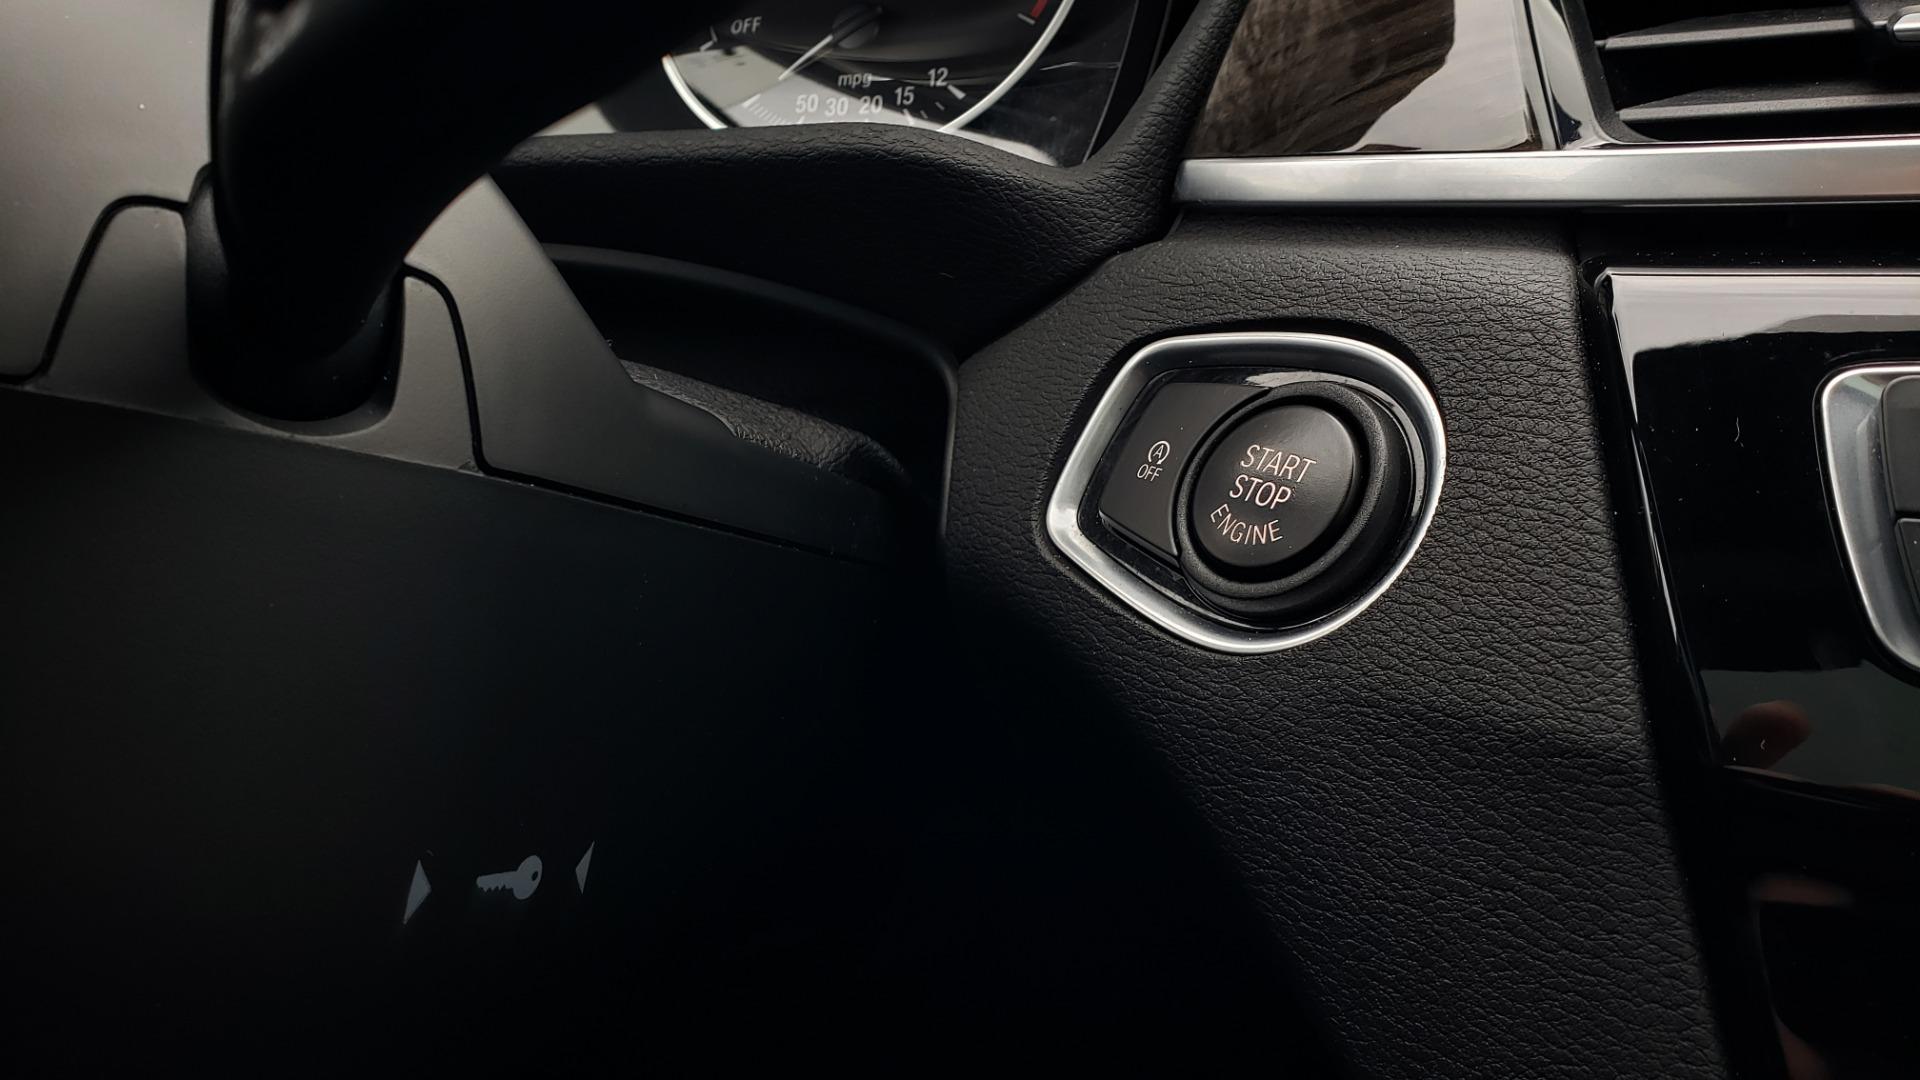 Used 2017 BMW X1 XDRIVE28I / PREM PKG / DRIVER ASST / NAV / CLD WTHR for sale Sold at Formula Imports in Charlotte NC 28227 46